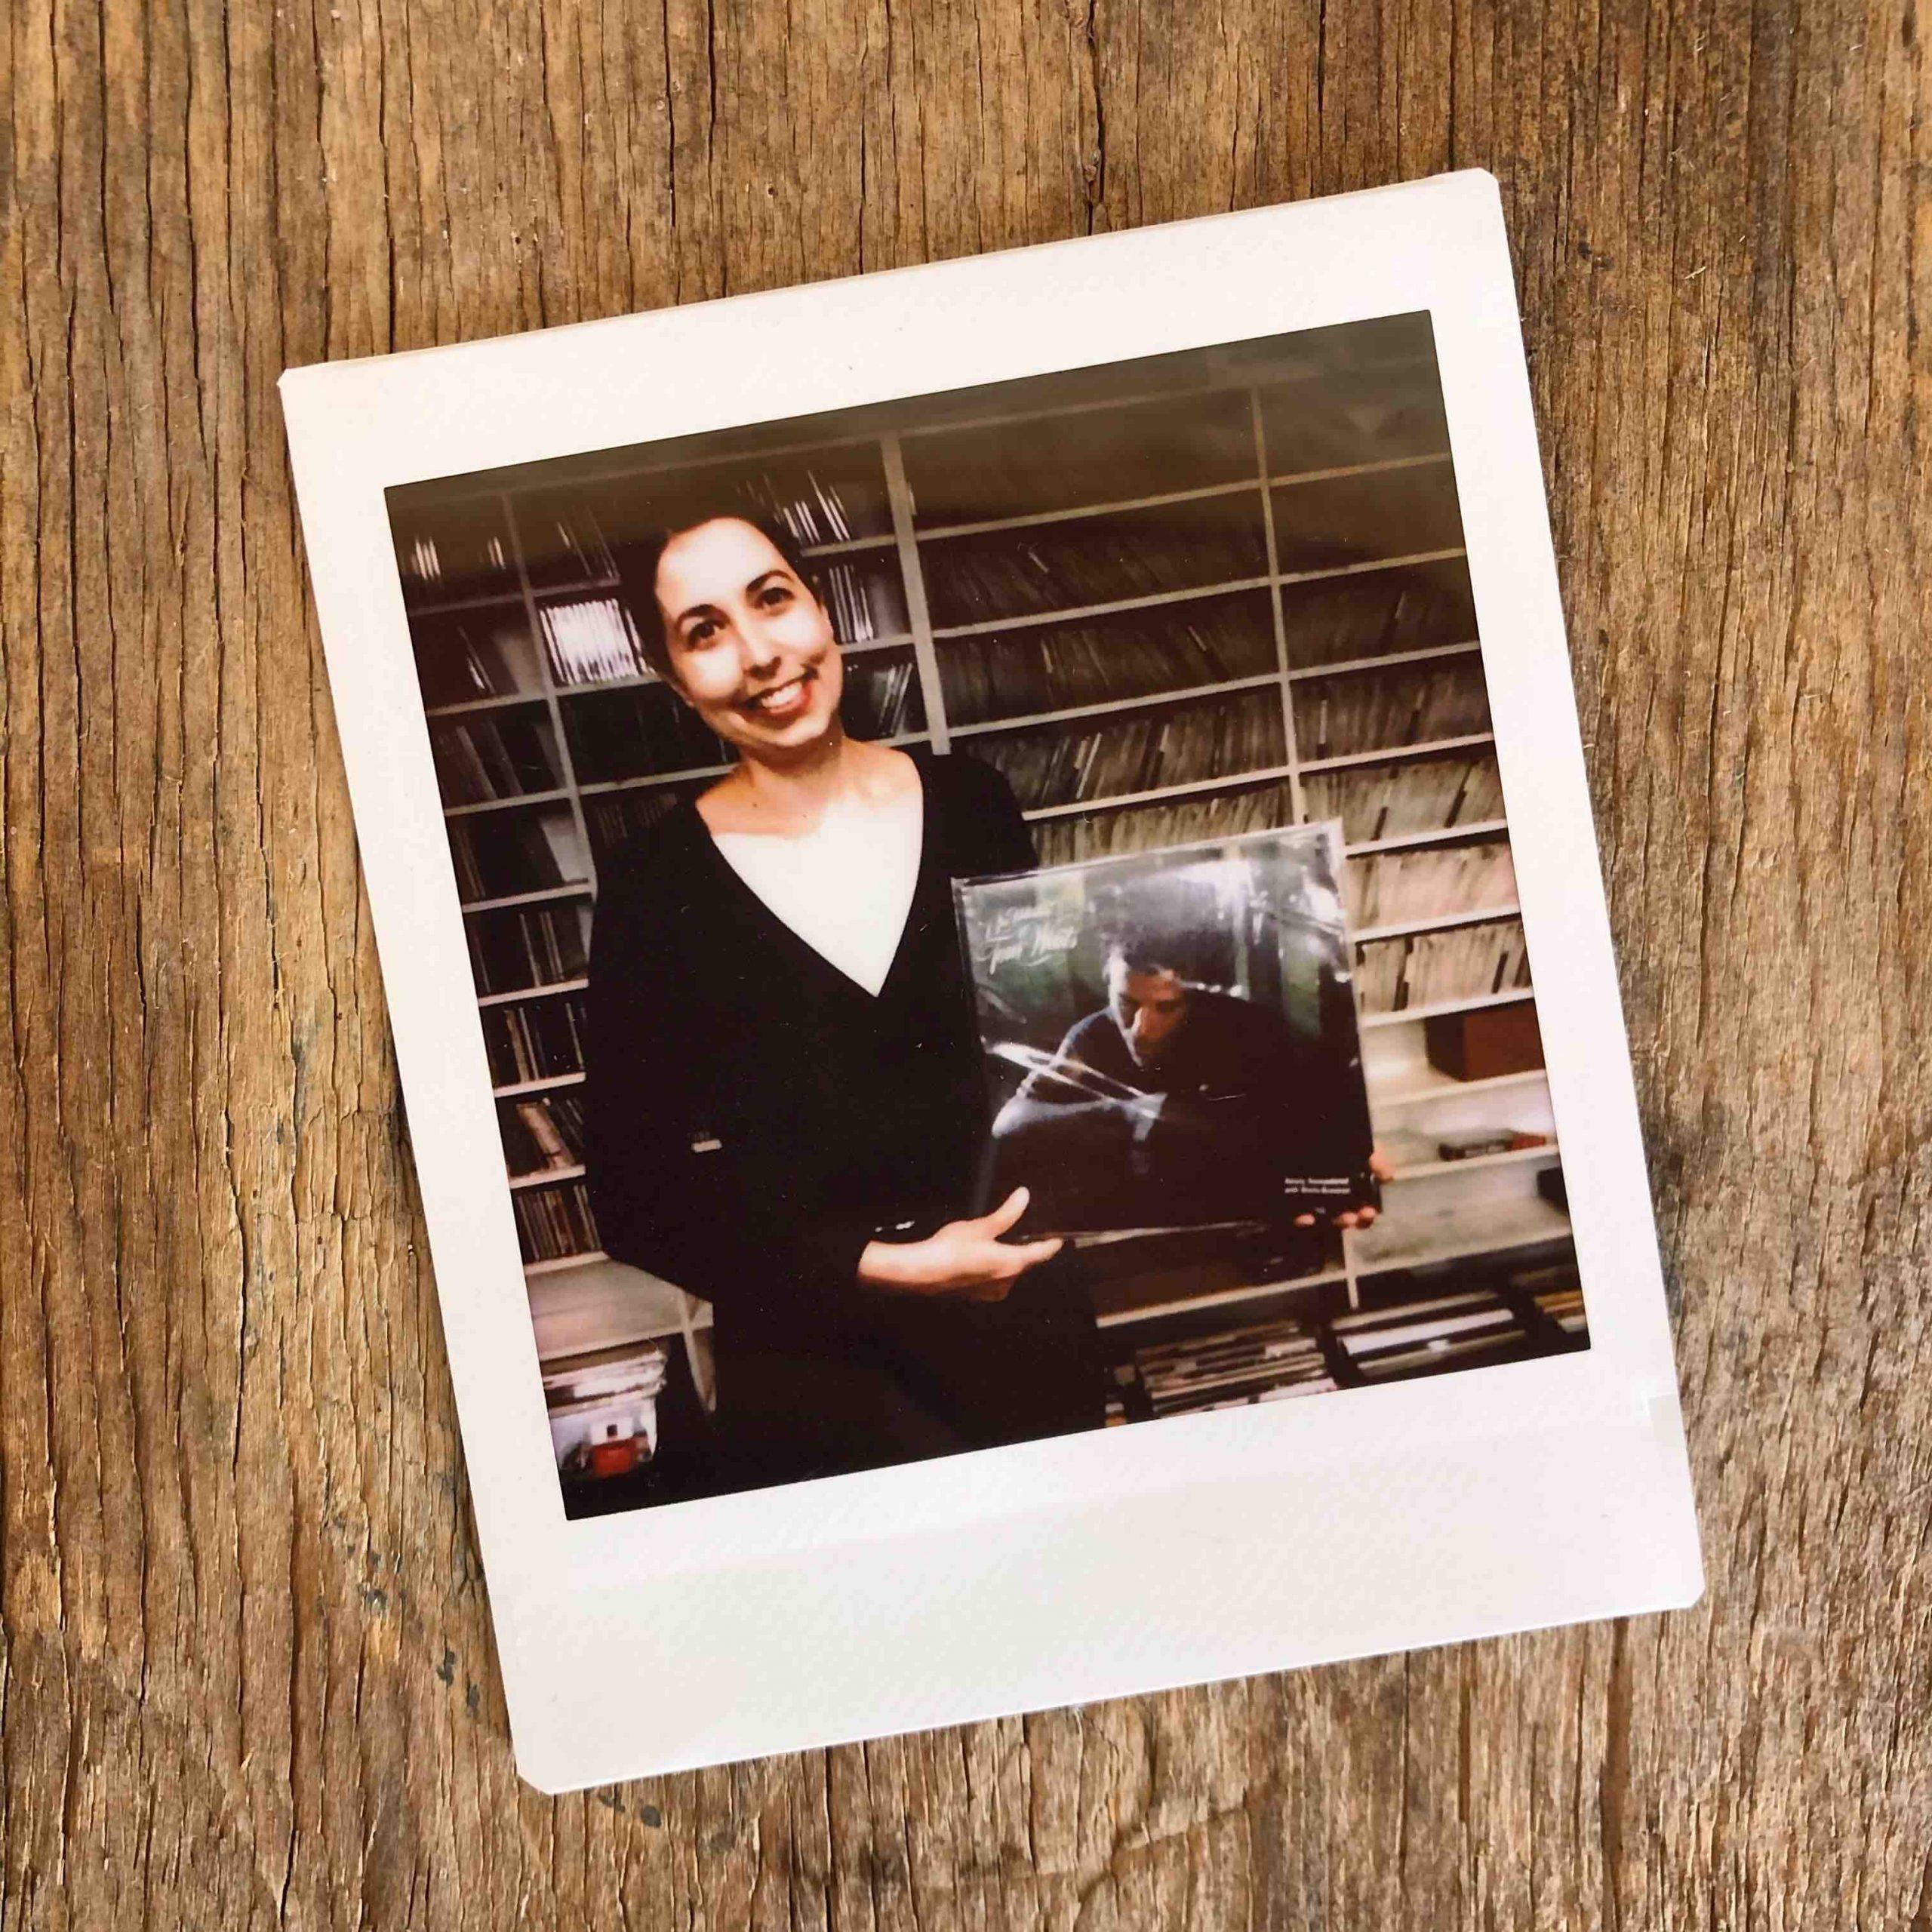 Polaroid of girl holding a Tom Waits record